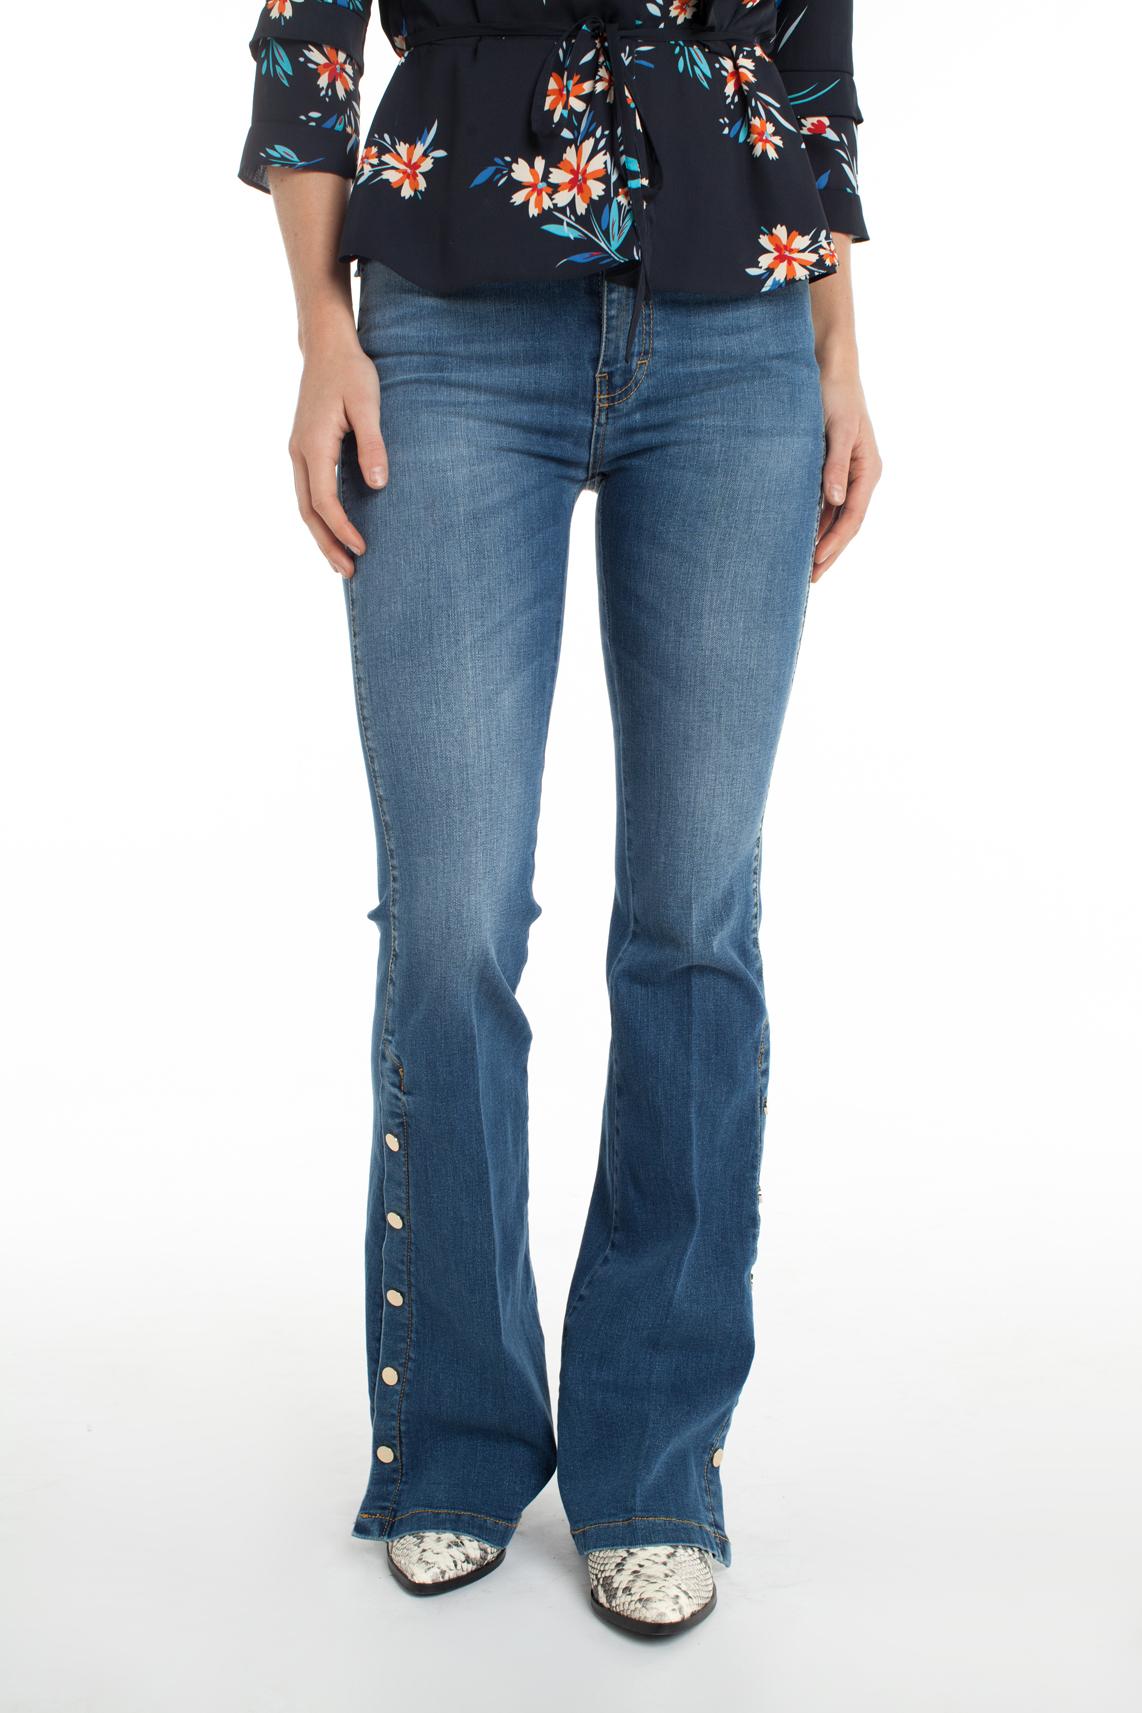 Kocca Dames Royo jeans Blauw